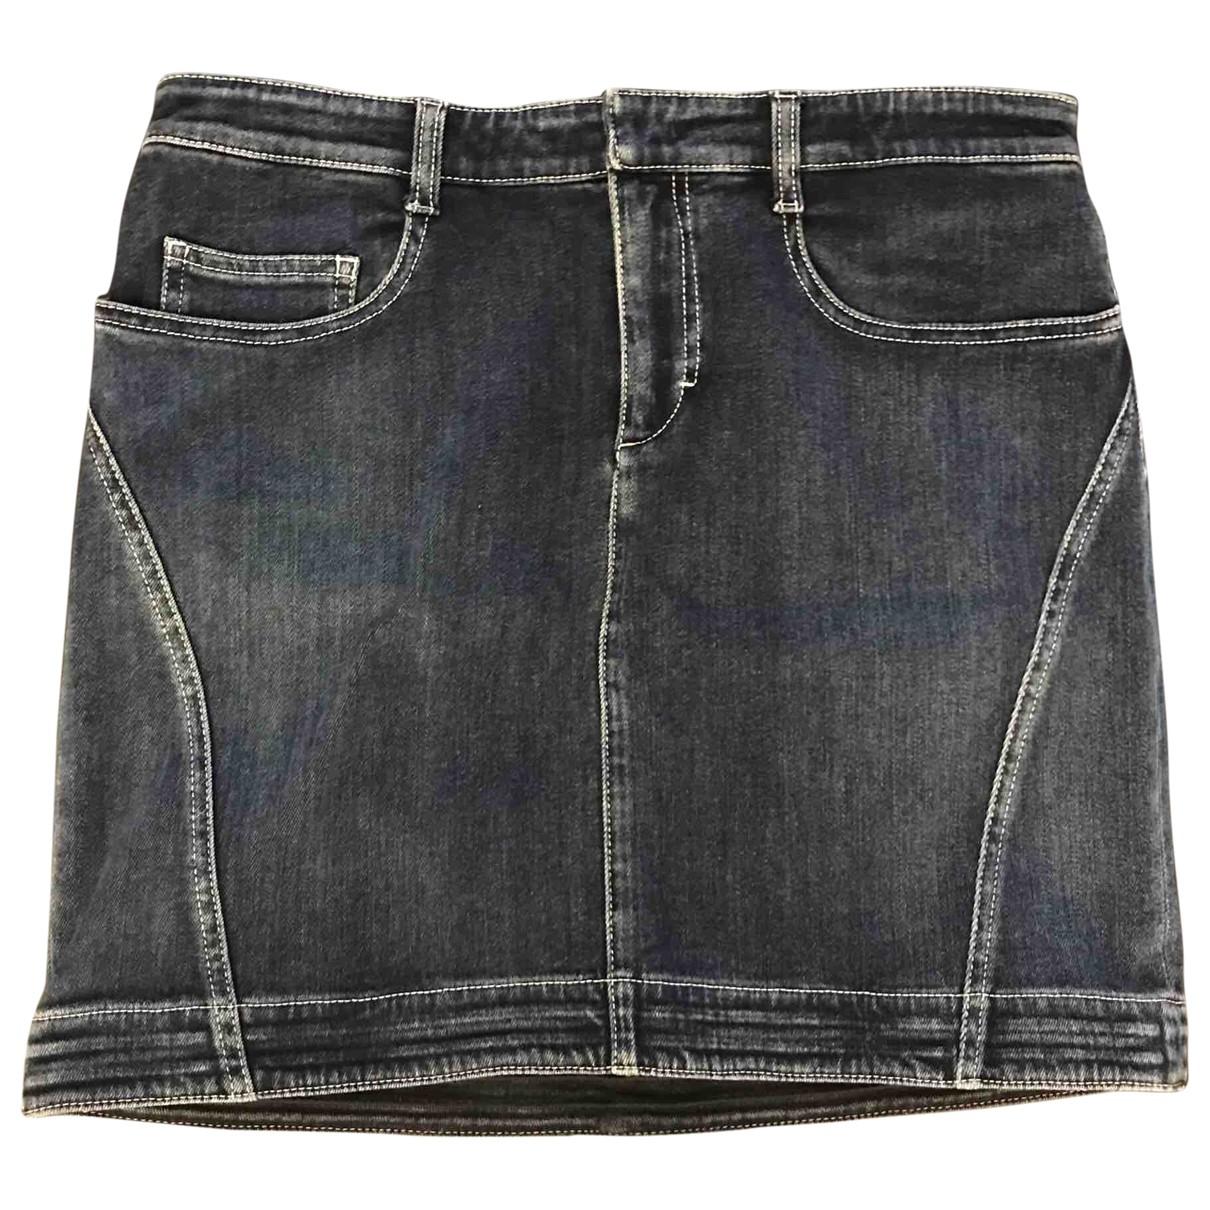 Louis Vuitton \N Navy Denim - Jeans skirt for Women 42 FR